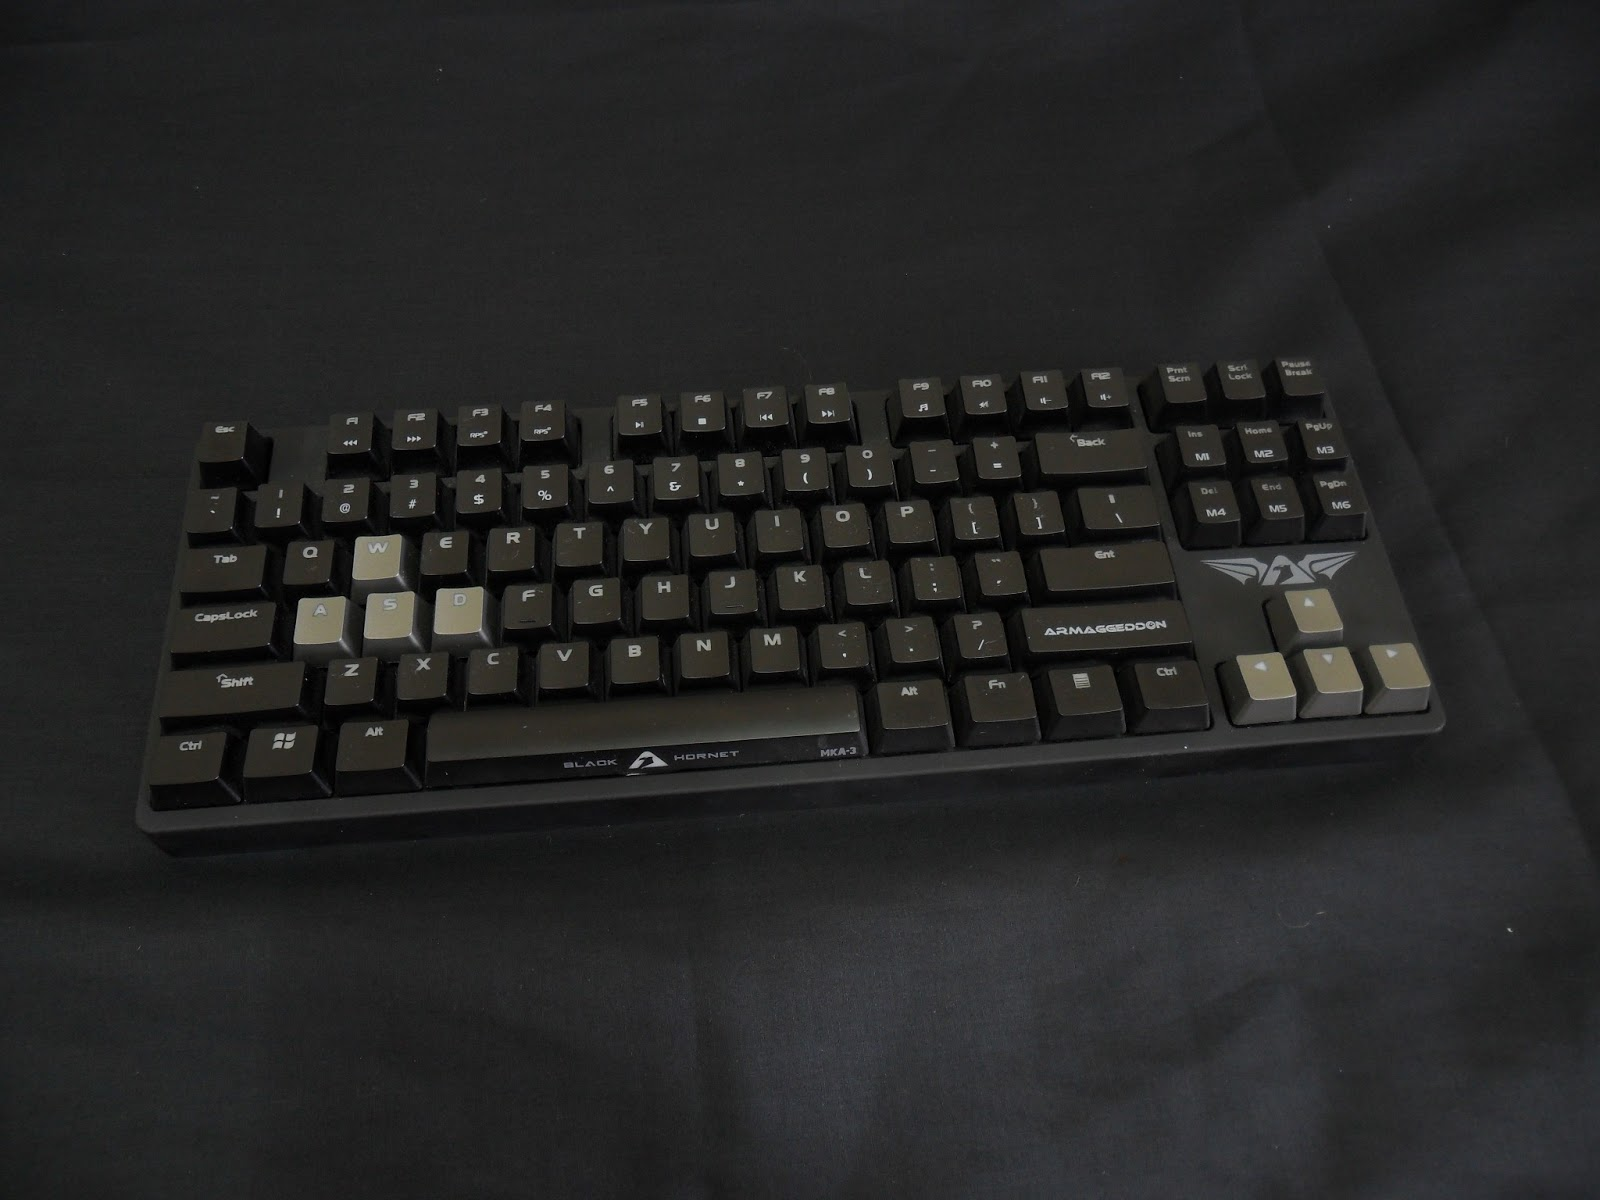 Unboxing & Review: Armaggeddon Black Hornet MKA-3 Mechanical Gaming Keyboard 5